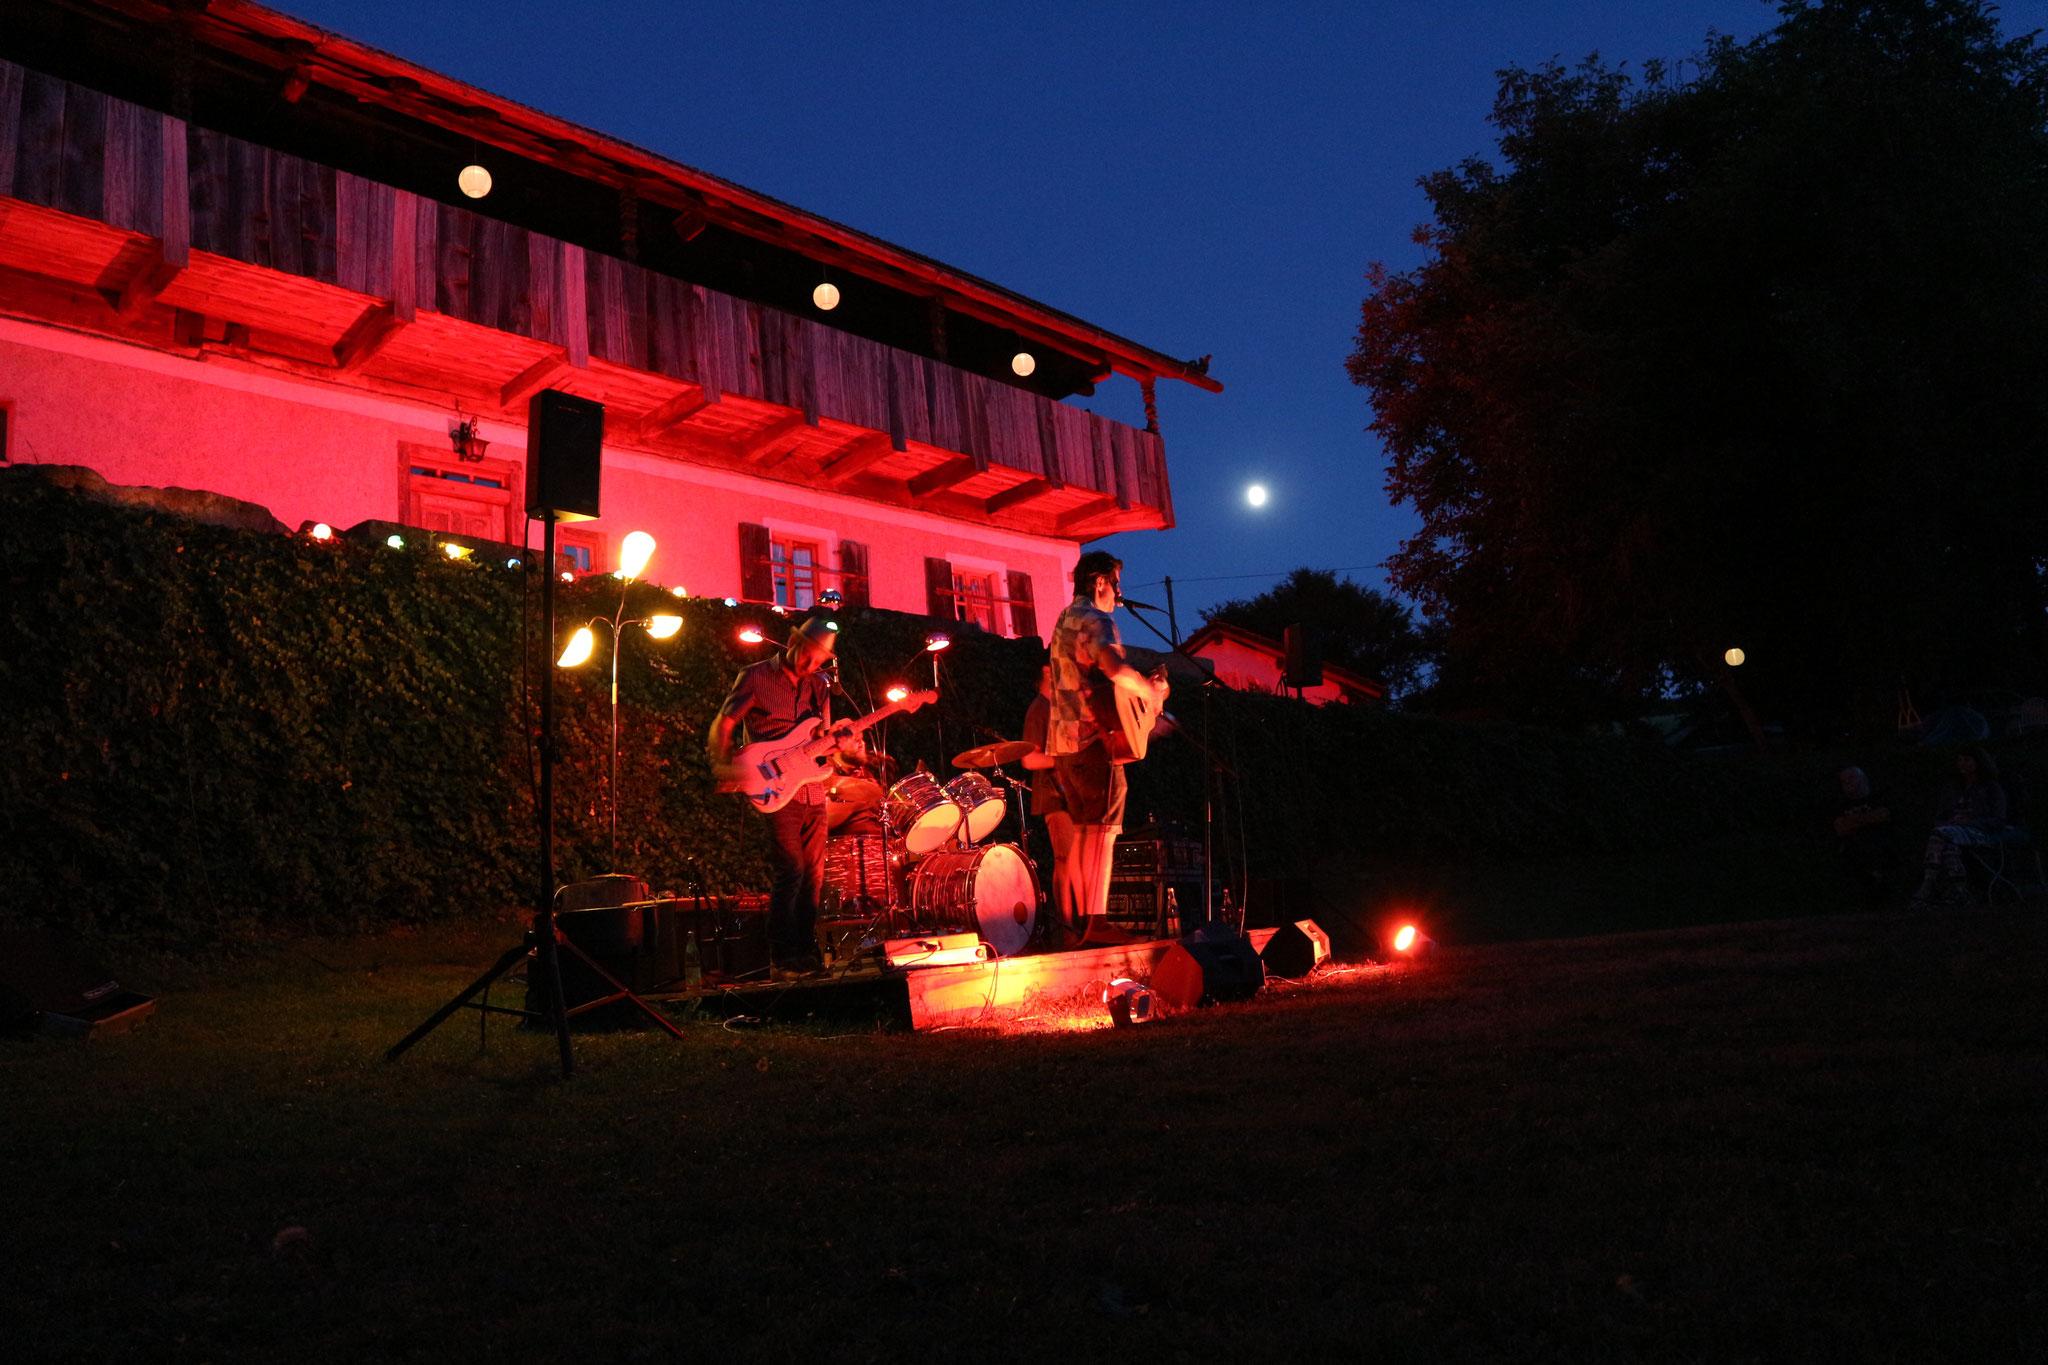 2020: Reverent Stomp & The Flying Dishes aus München (Rythm & Blues)